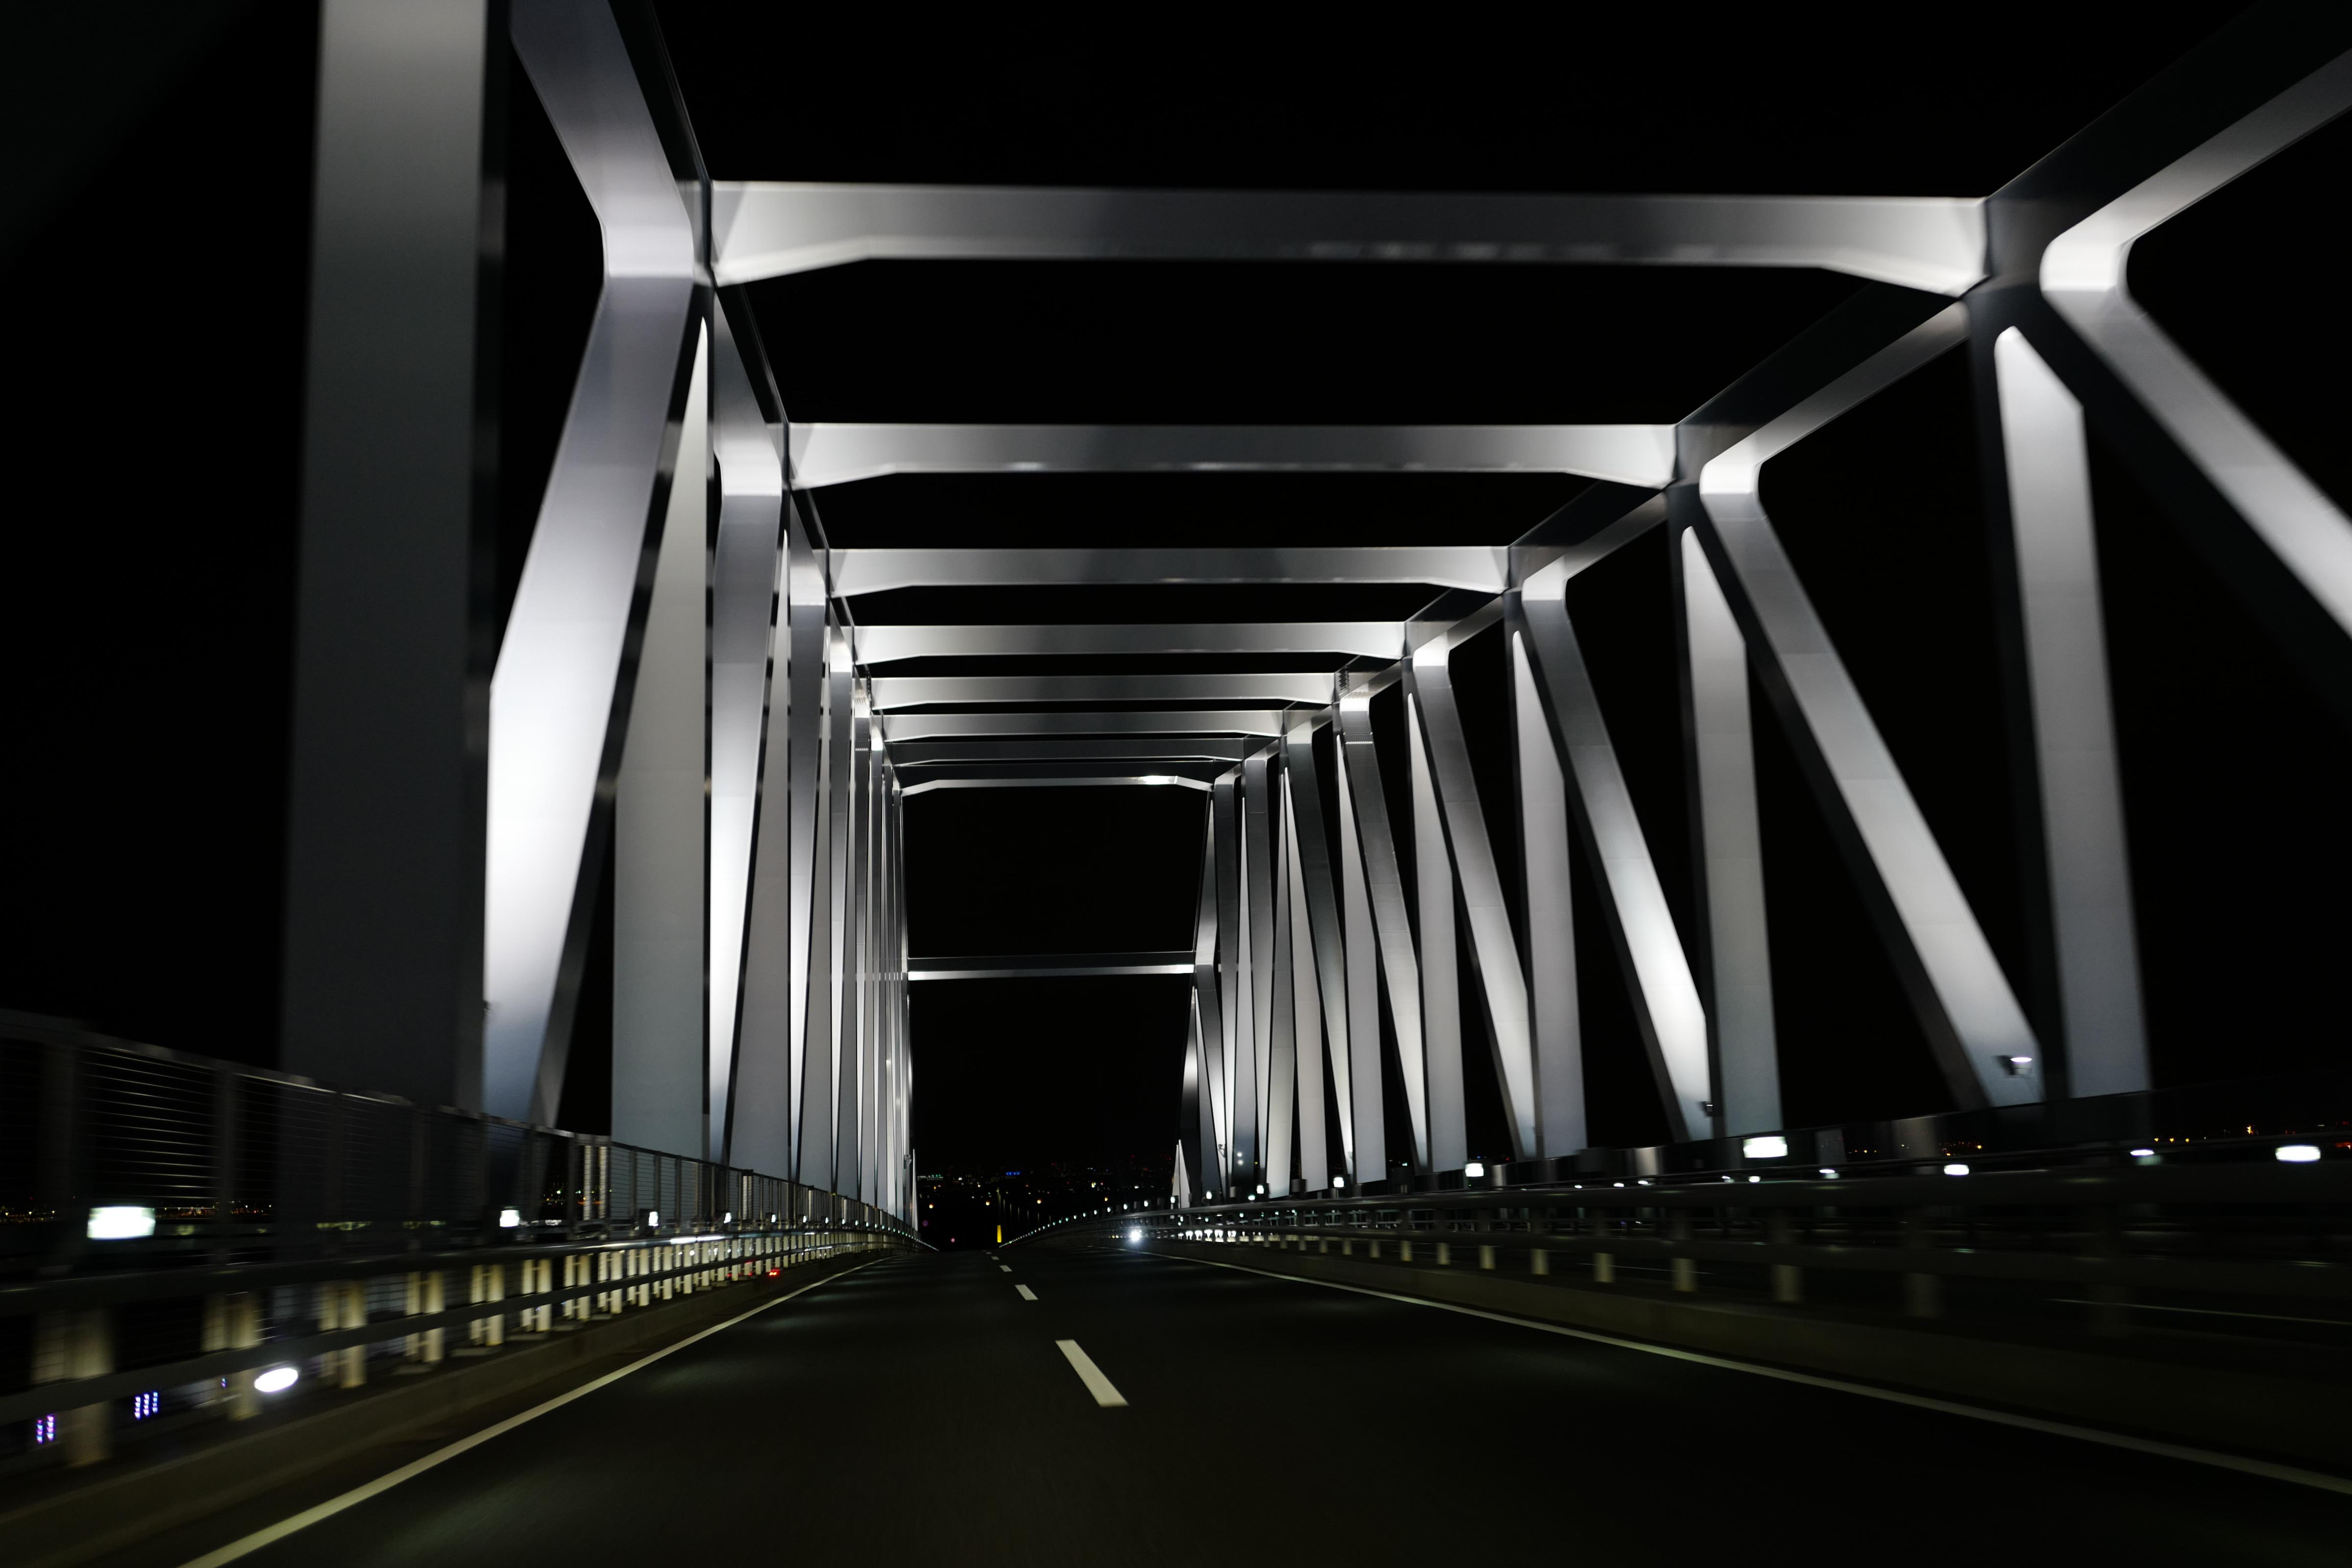 ... illumination, lighting, line, darkness, landmark, tokyogatebridge,  summilux, leicaq, summilux1728, q, 1728, black and white, monochrome  photography, ...